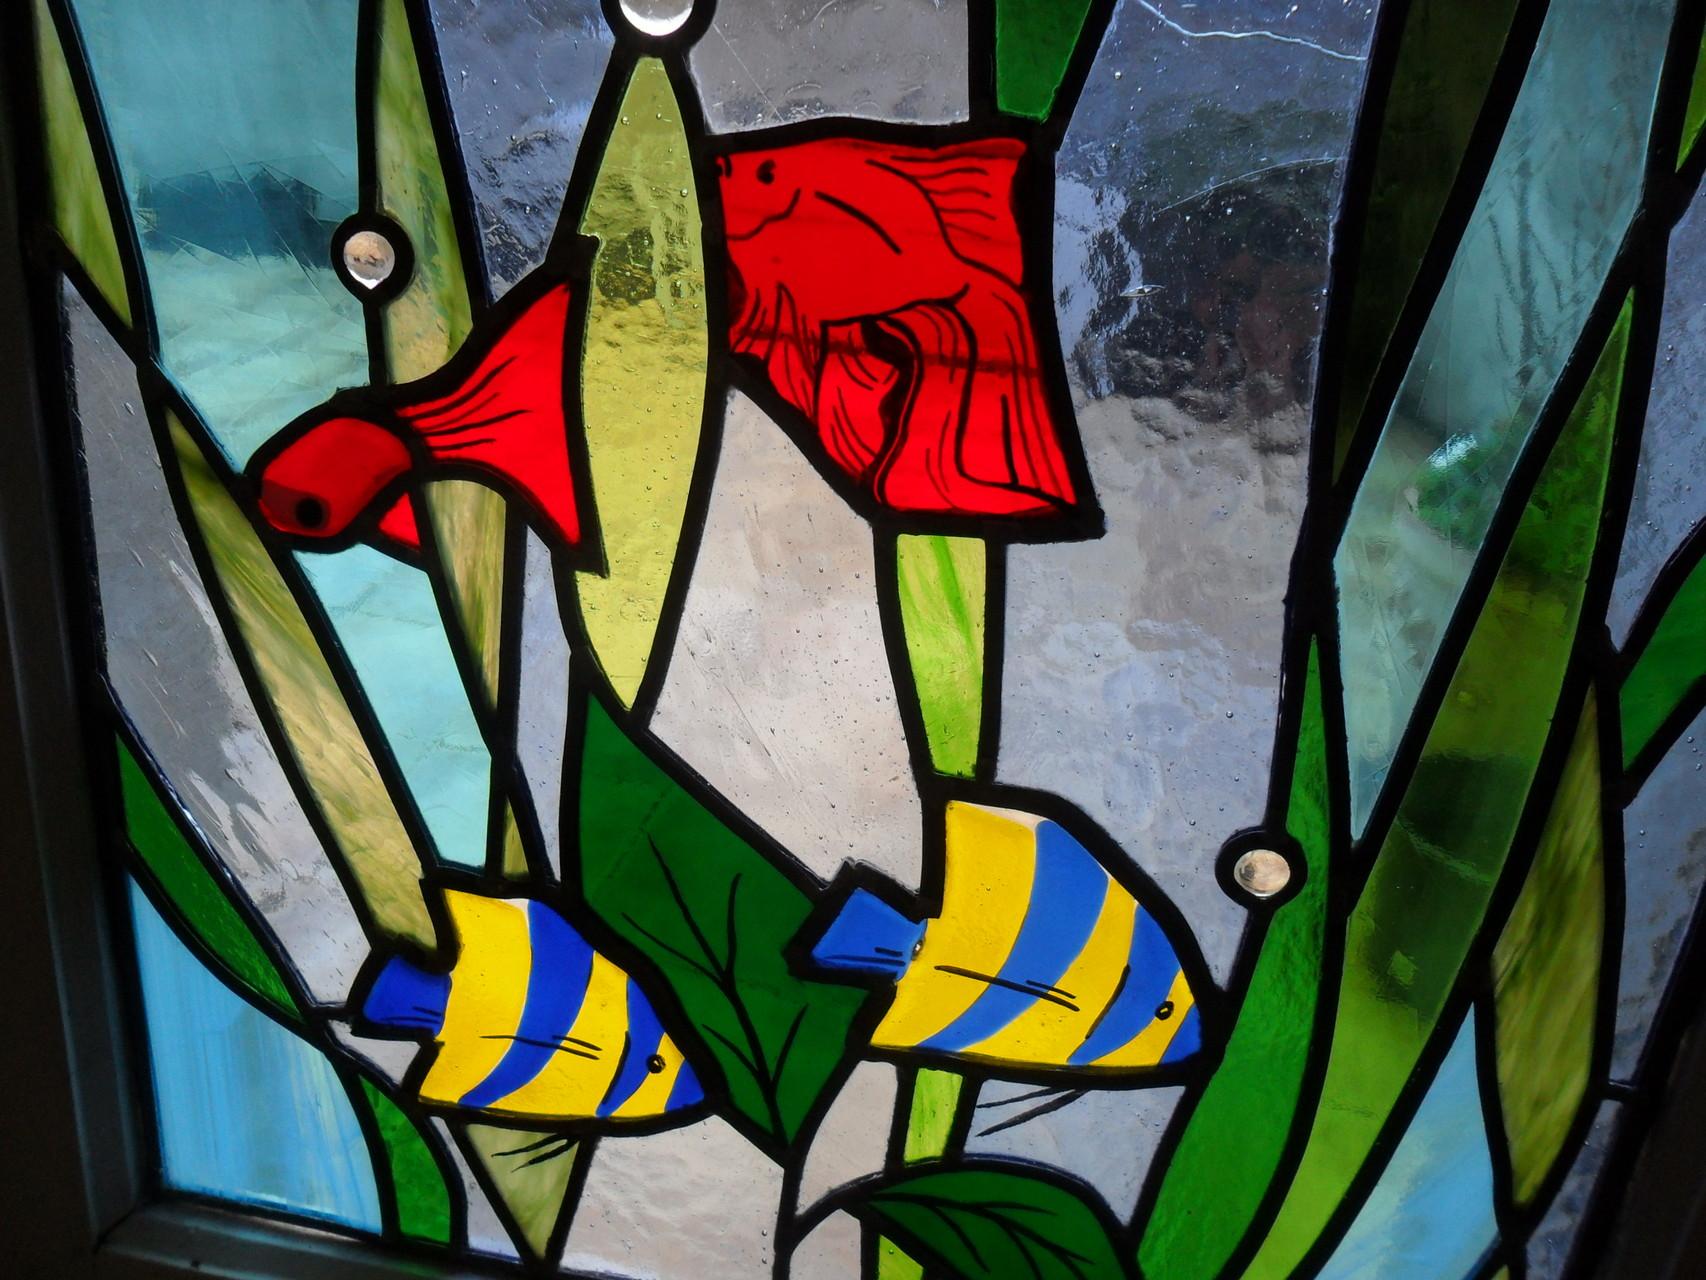 Vitrail Aquarium-vitrail au plomb, peinture, fusing